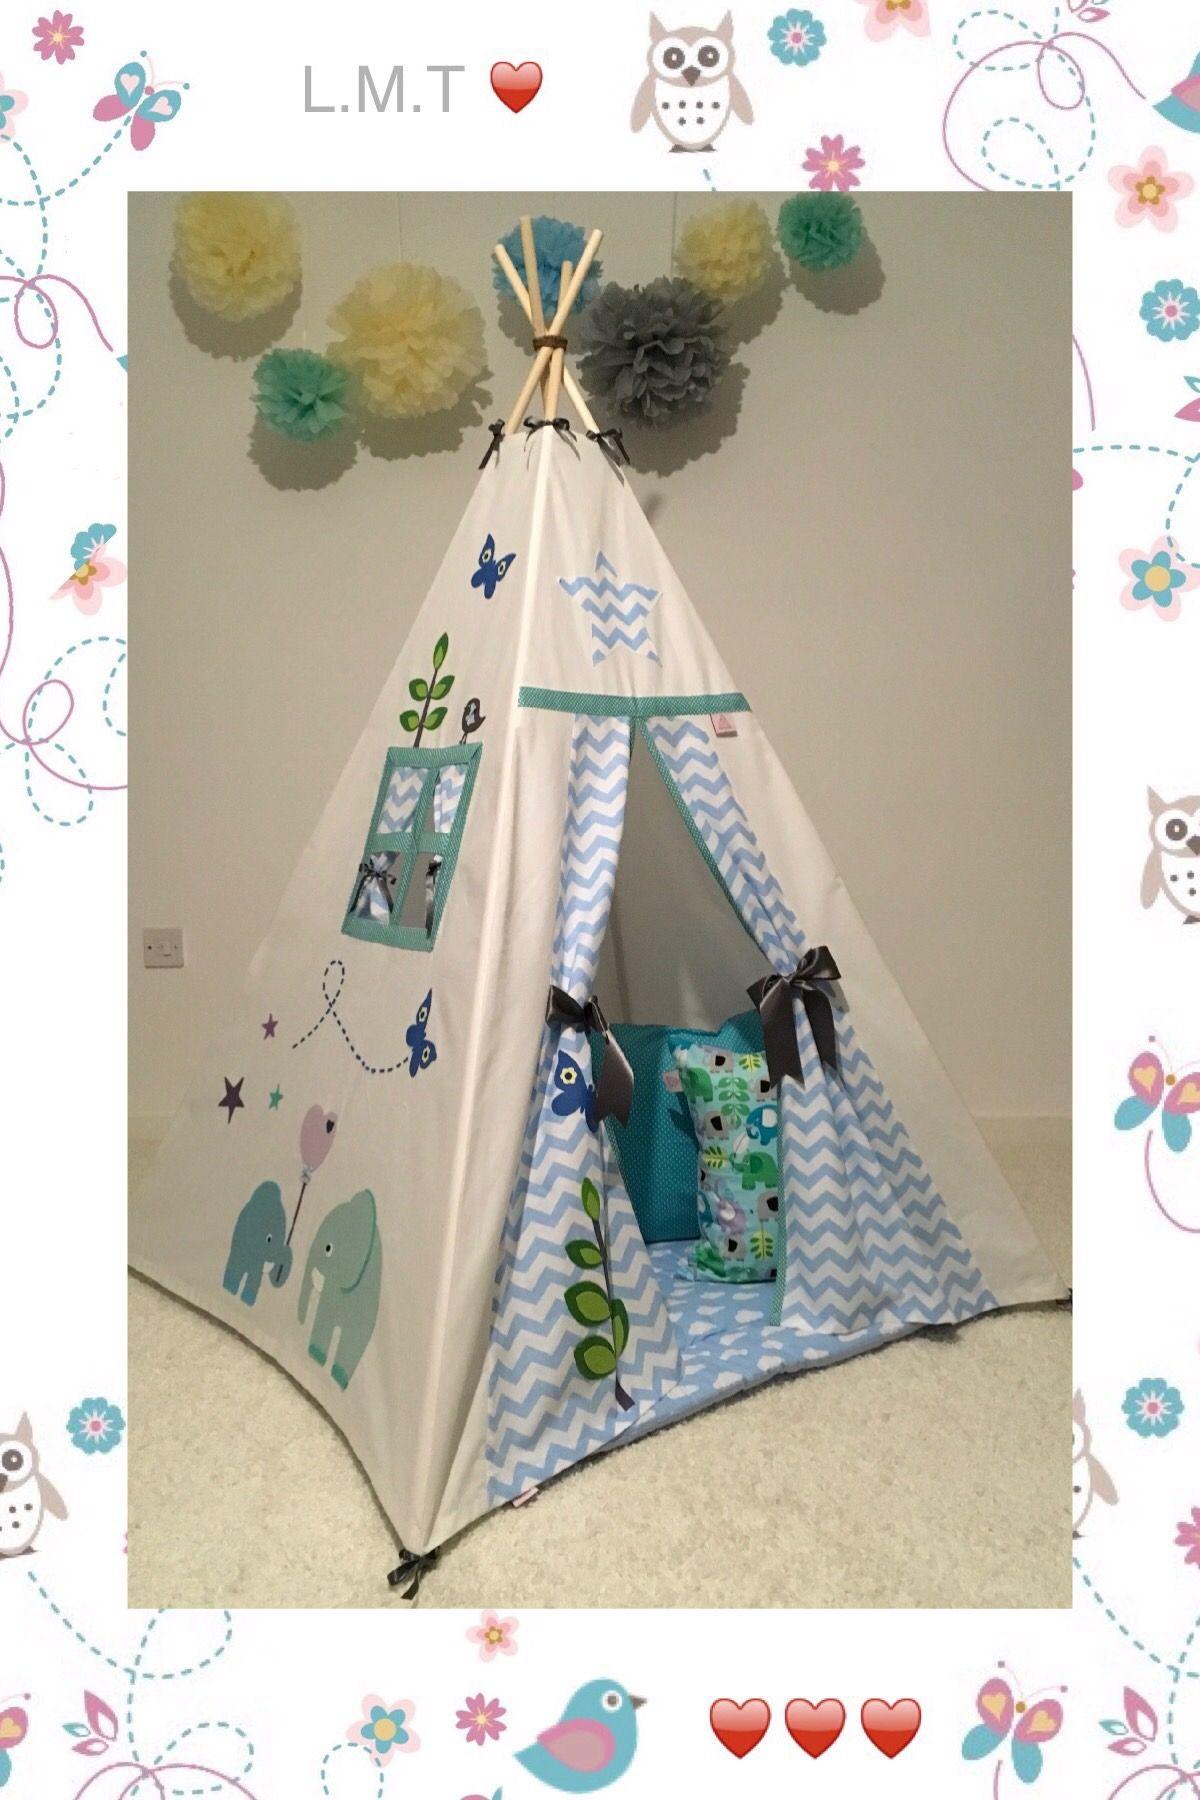 VARIOUS Children Padded Wadded Floor Play Mat Baby Toddler Tent Kids Den Teepee